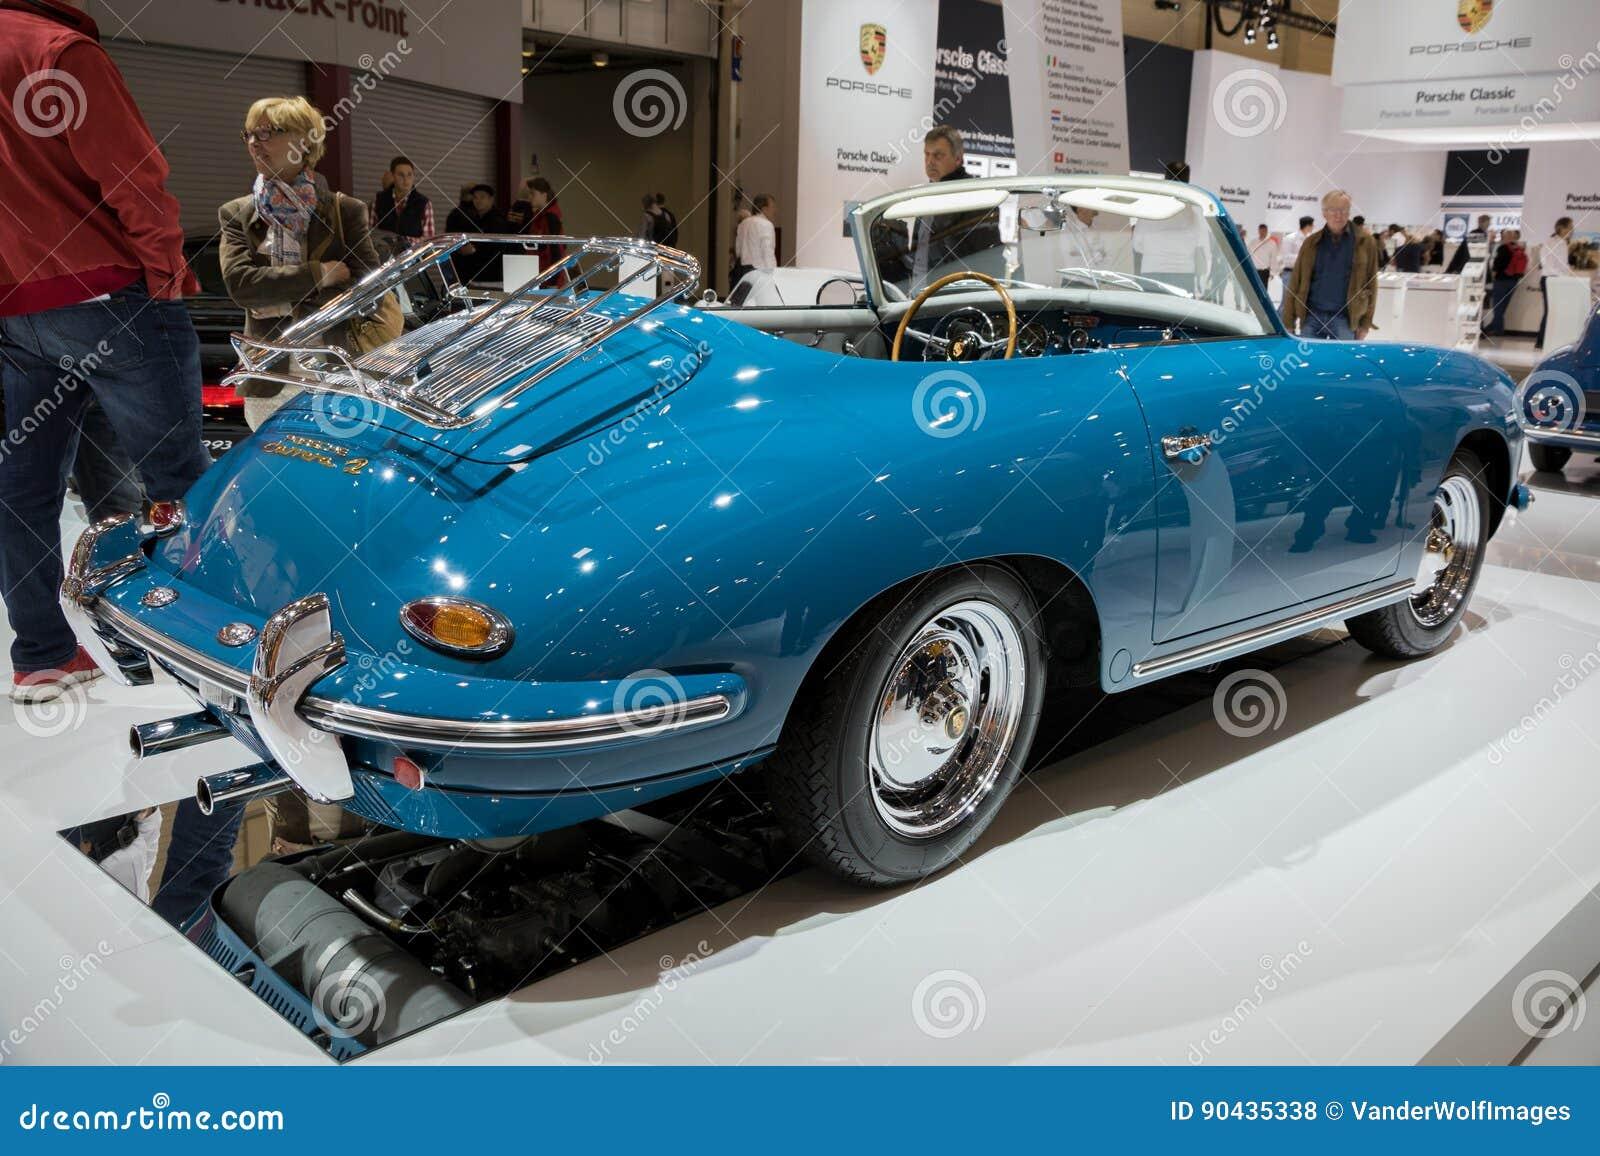 1963 porsche 356b carrera 2 cabriolet classic car editorial image 90435338. Black Bedroom Furniture Sets. Home Design Ideas